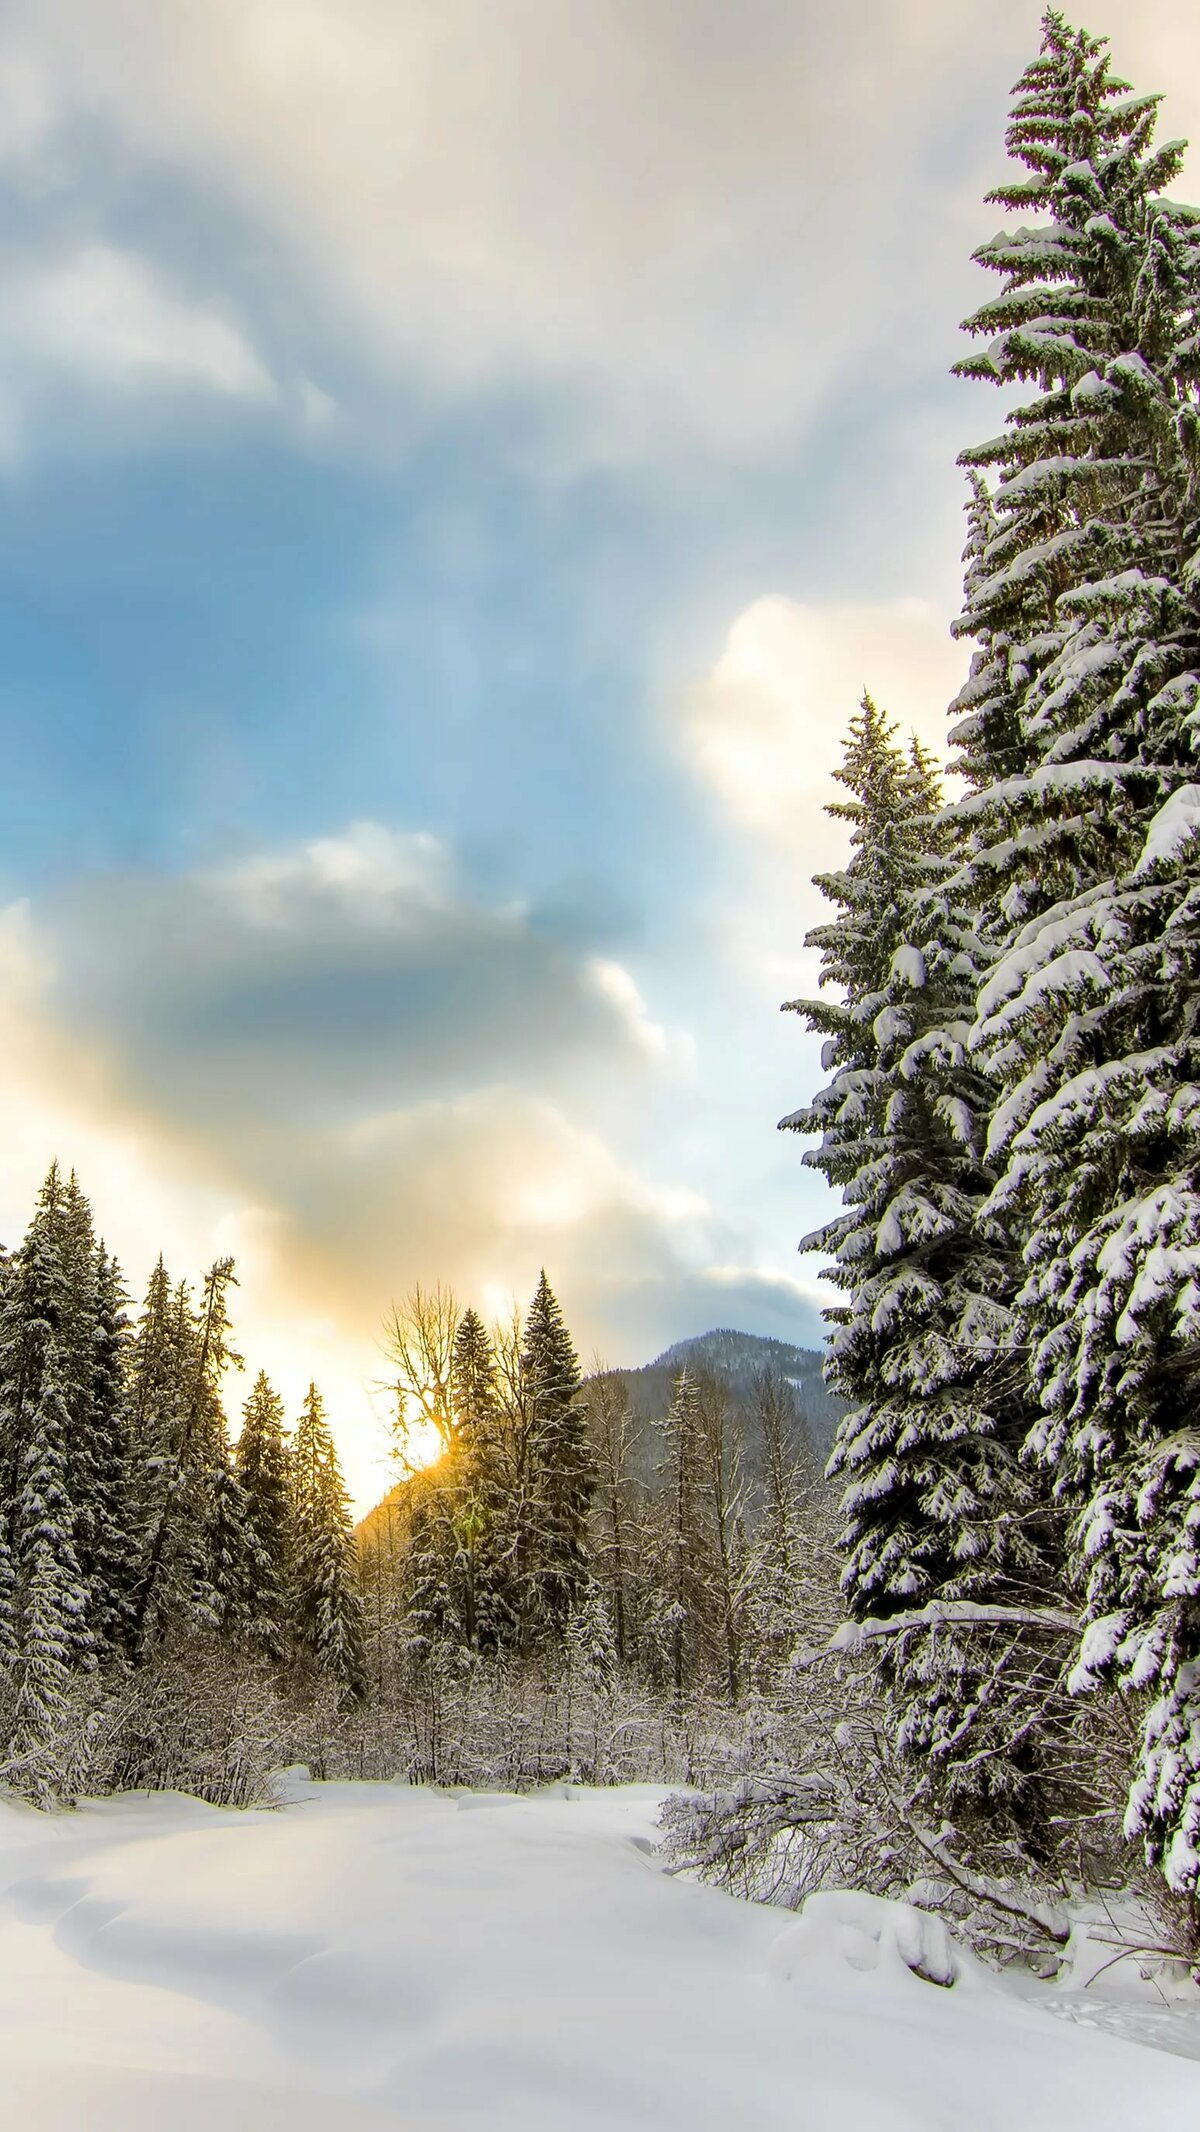 Фото зимы леса на телефон